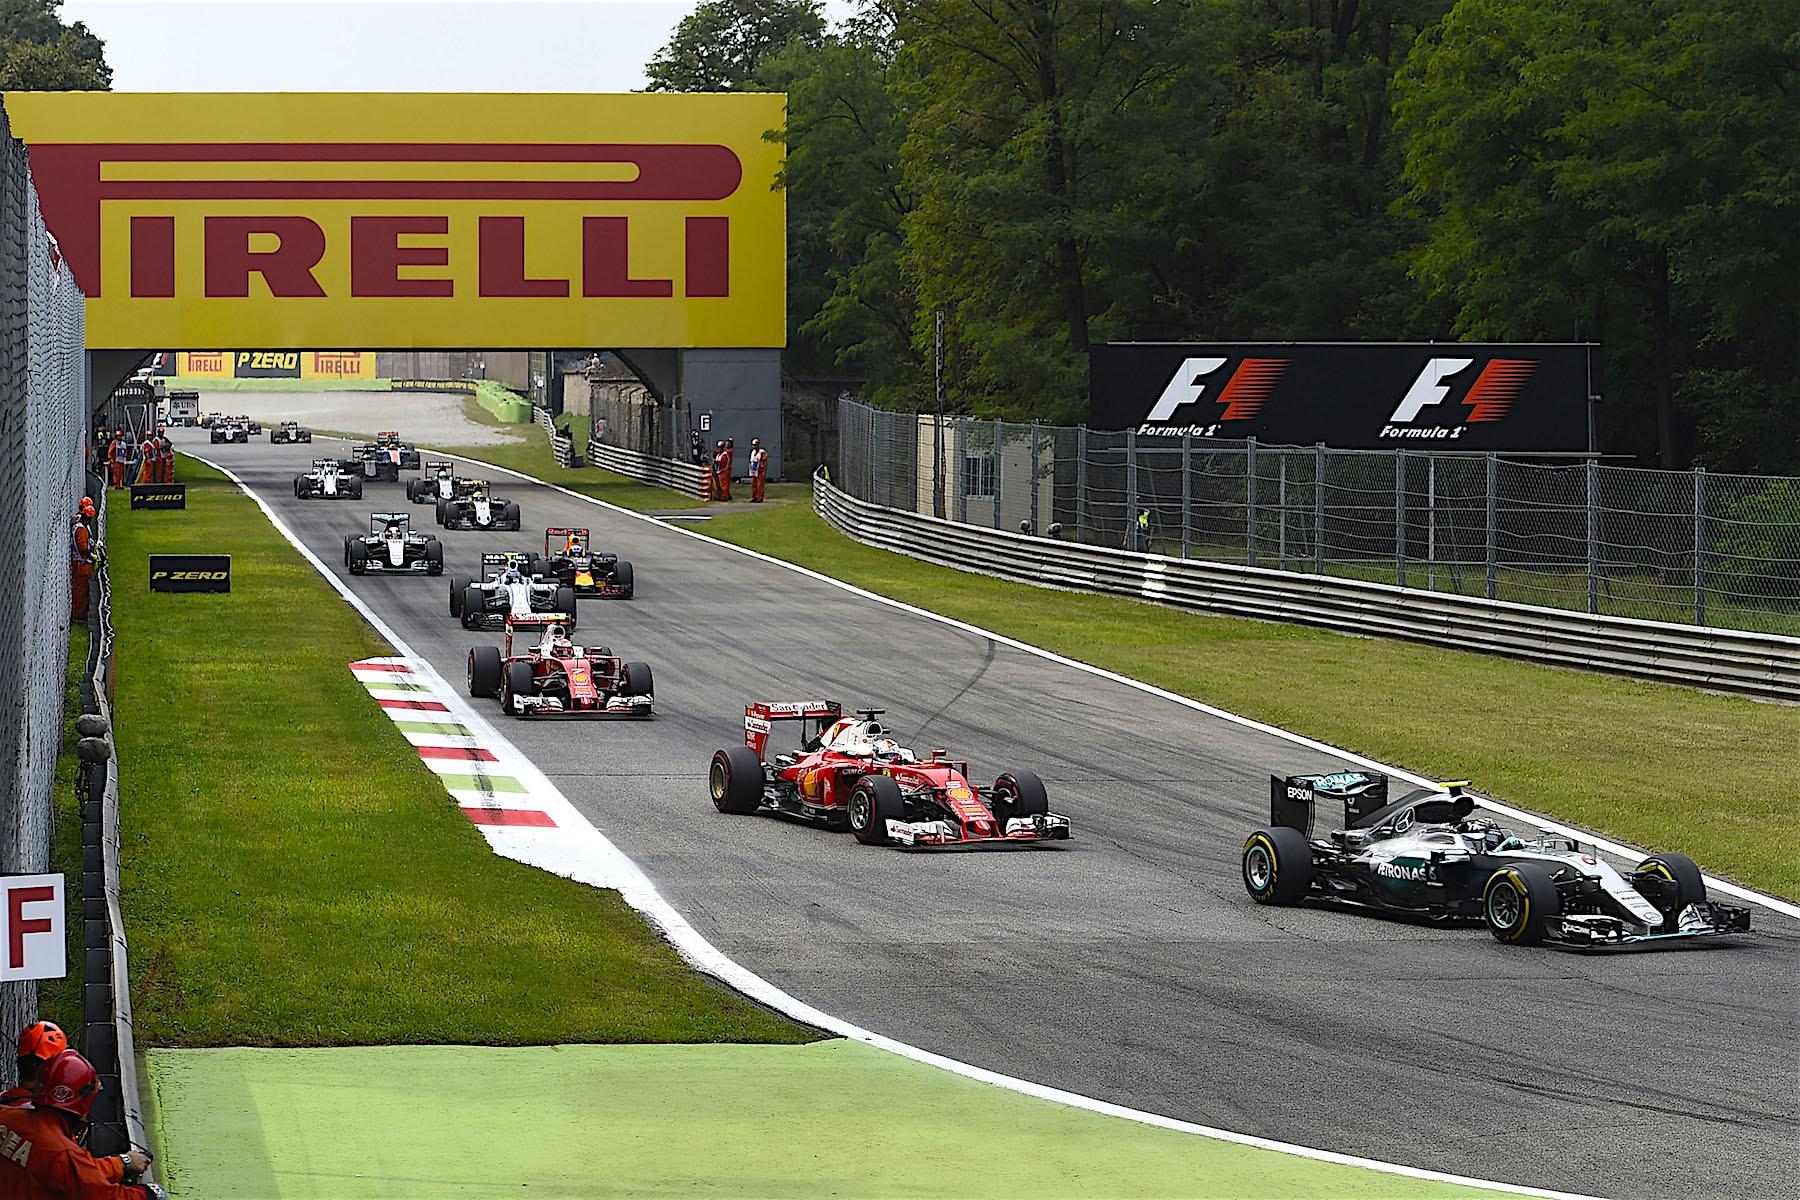 Salracing - First lap of the 2016 Italian Grand Prix